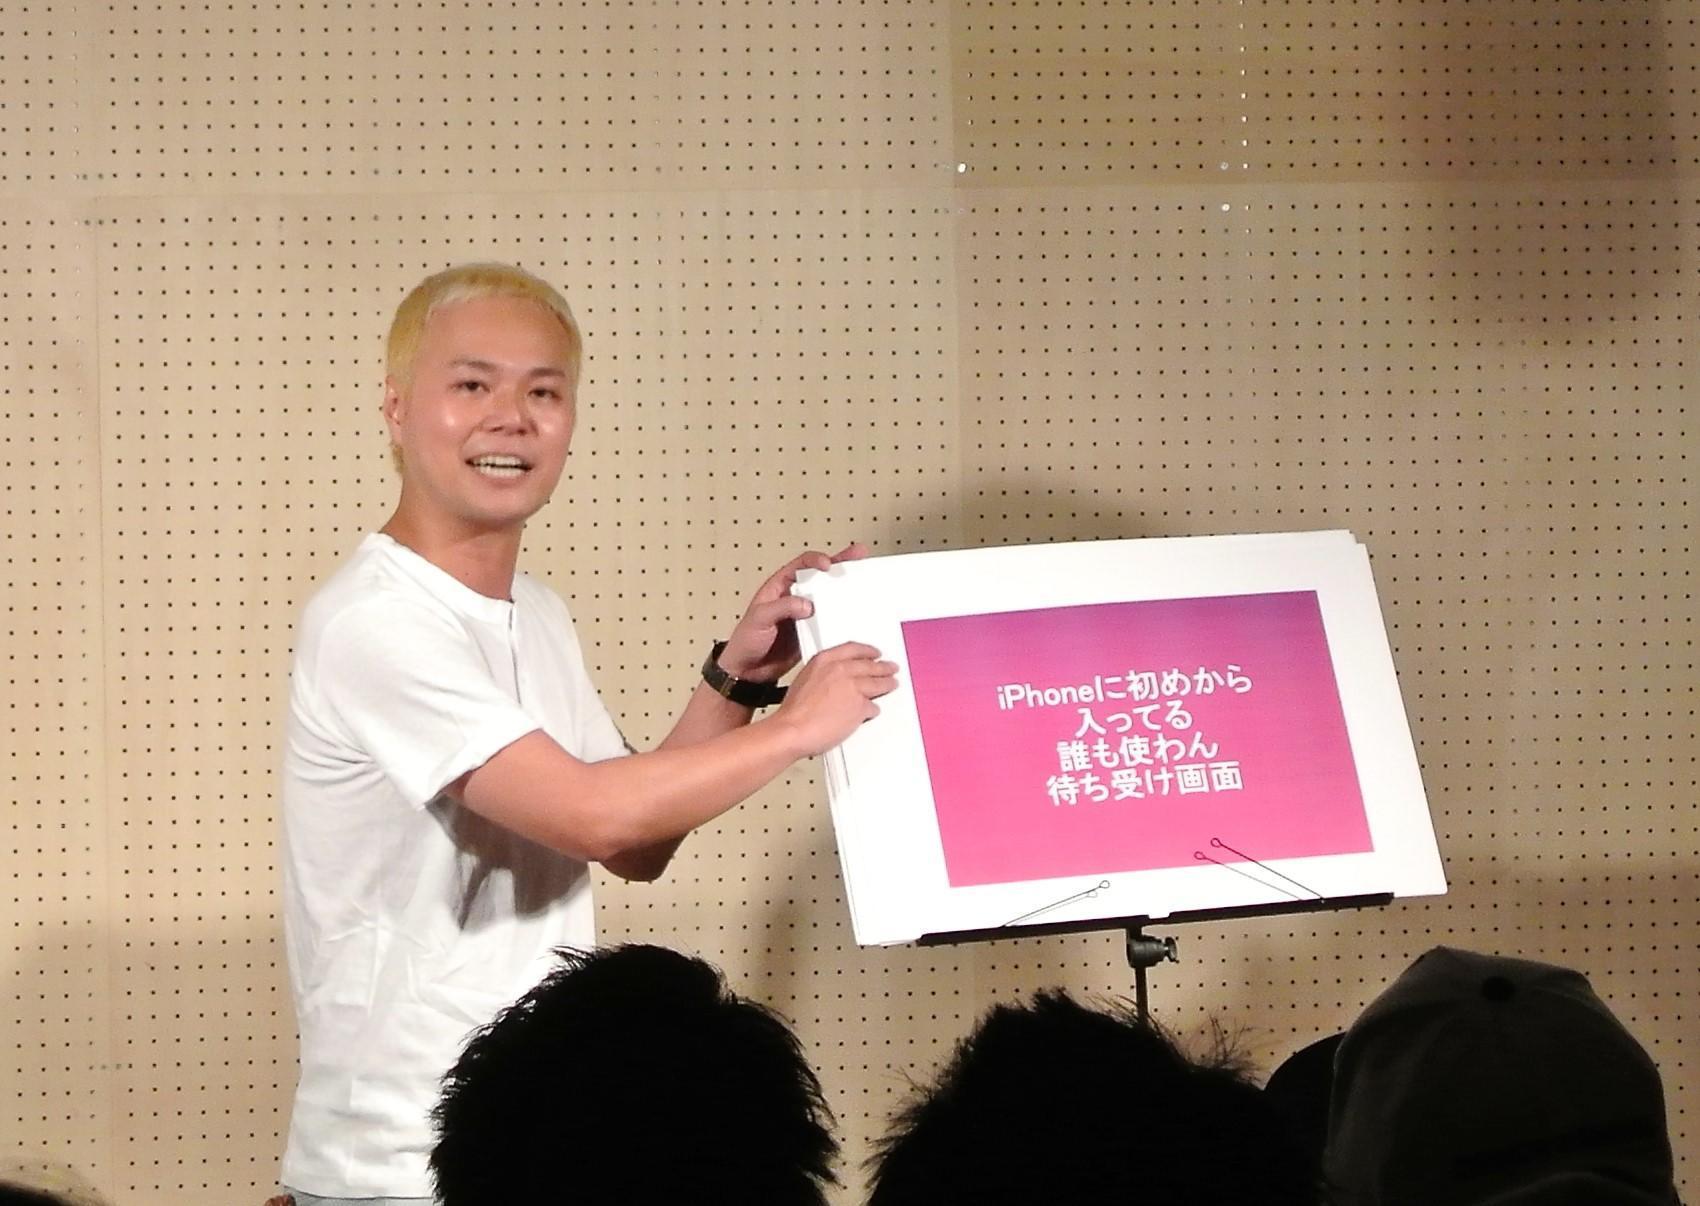 http://news.yoshimoto.co.jp/20171012190513-d5d698cbe1c926eb875d1bb1e2aa9663278a5588.jpg